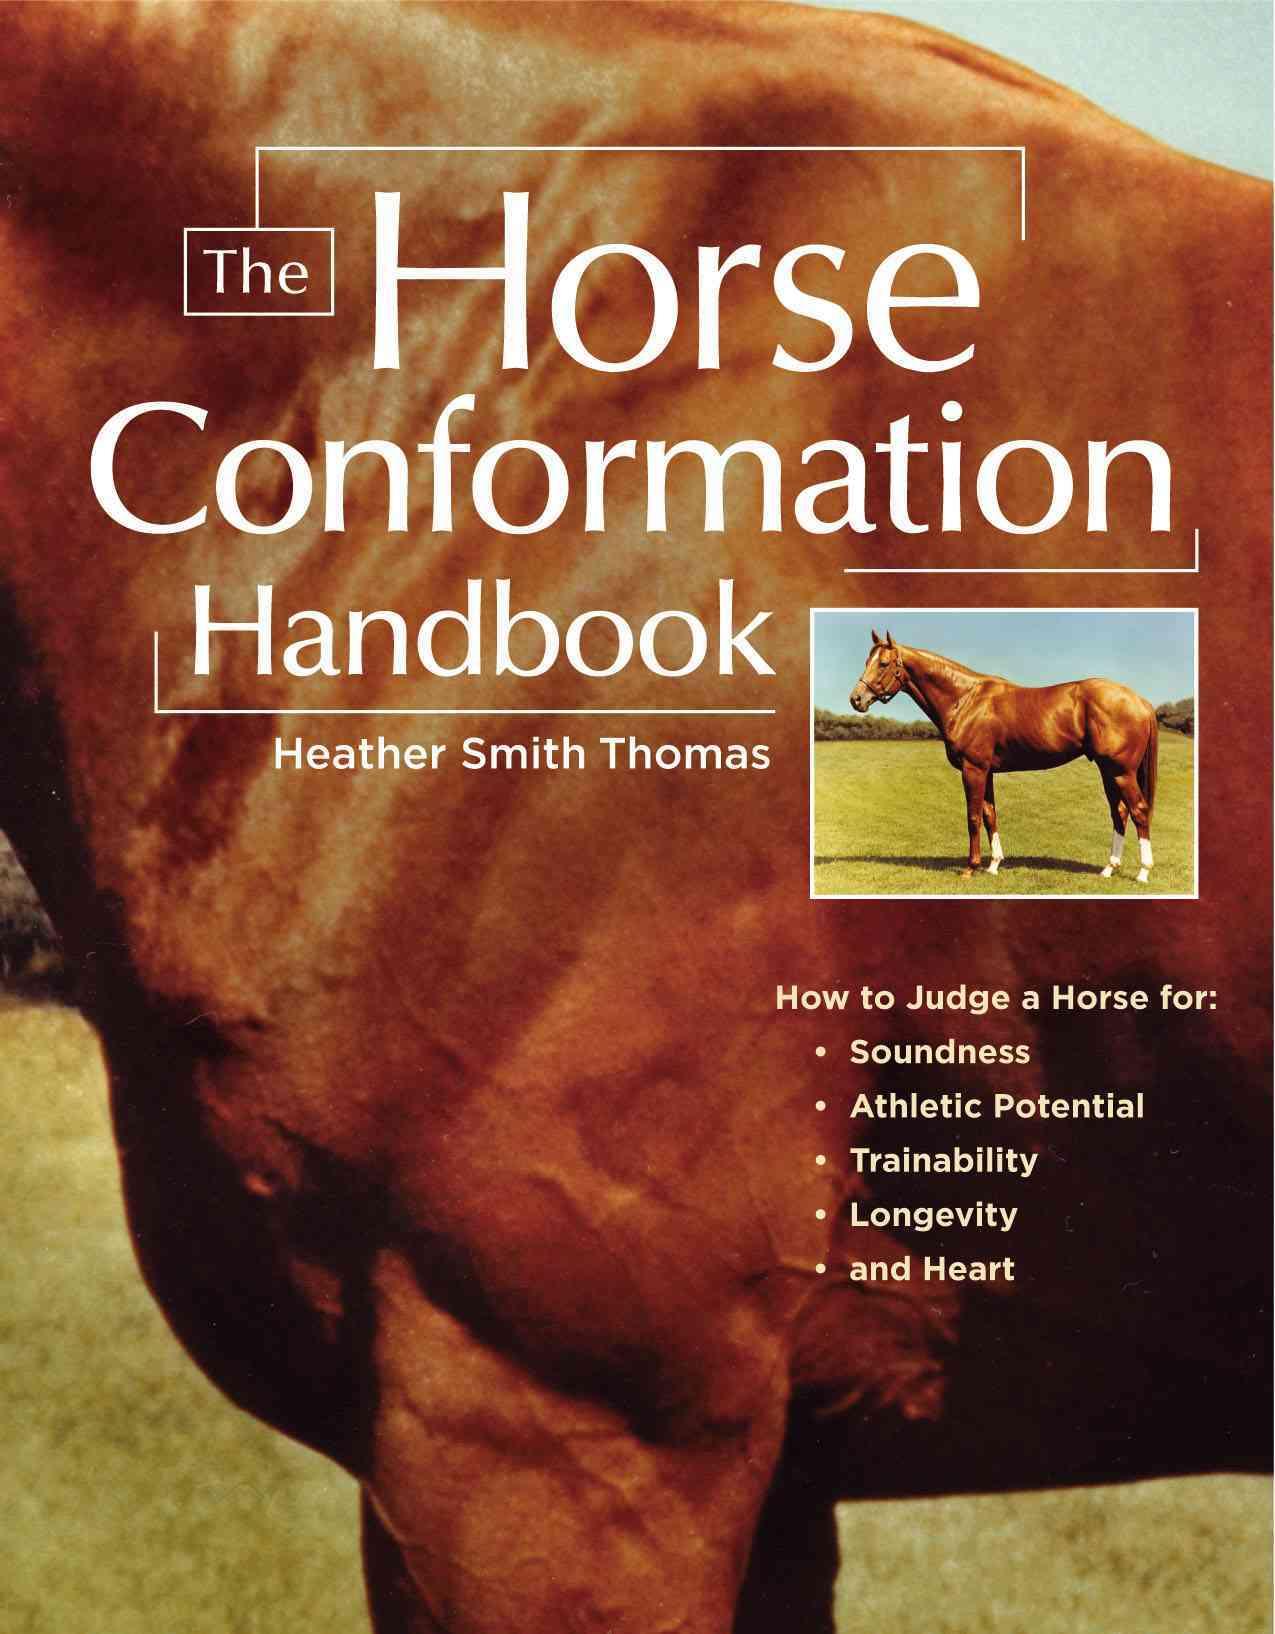 The Horse Conformation Handbook (Paperback)